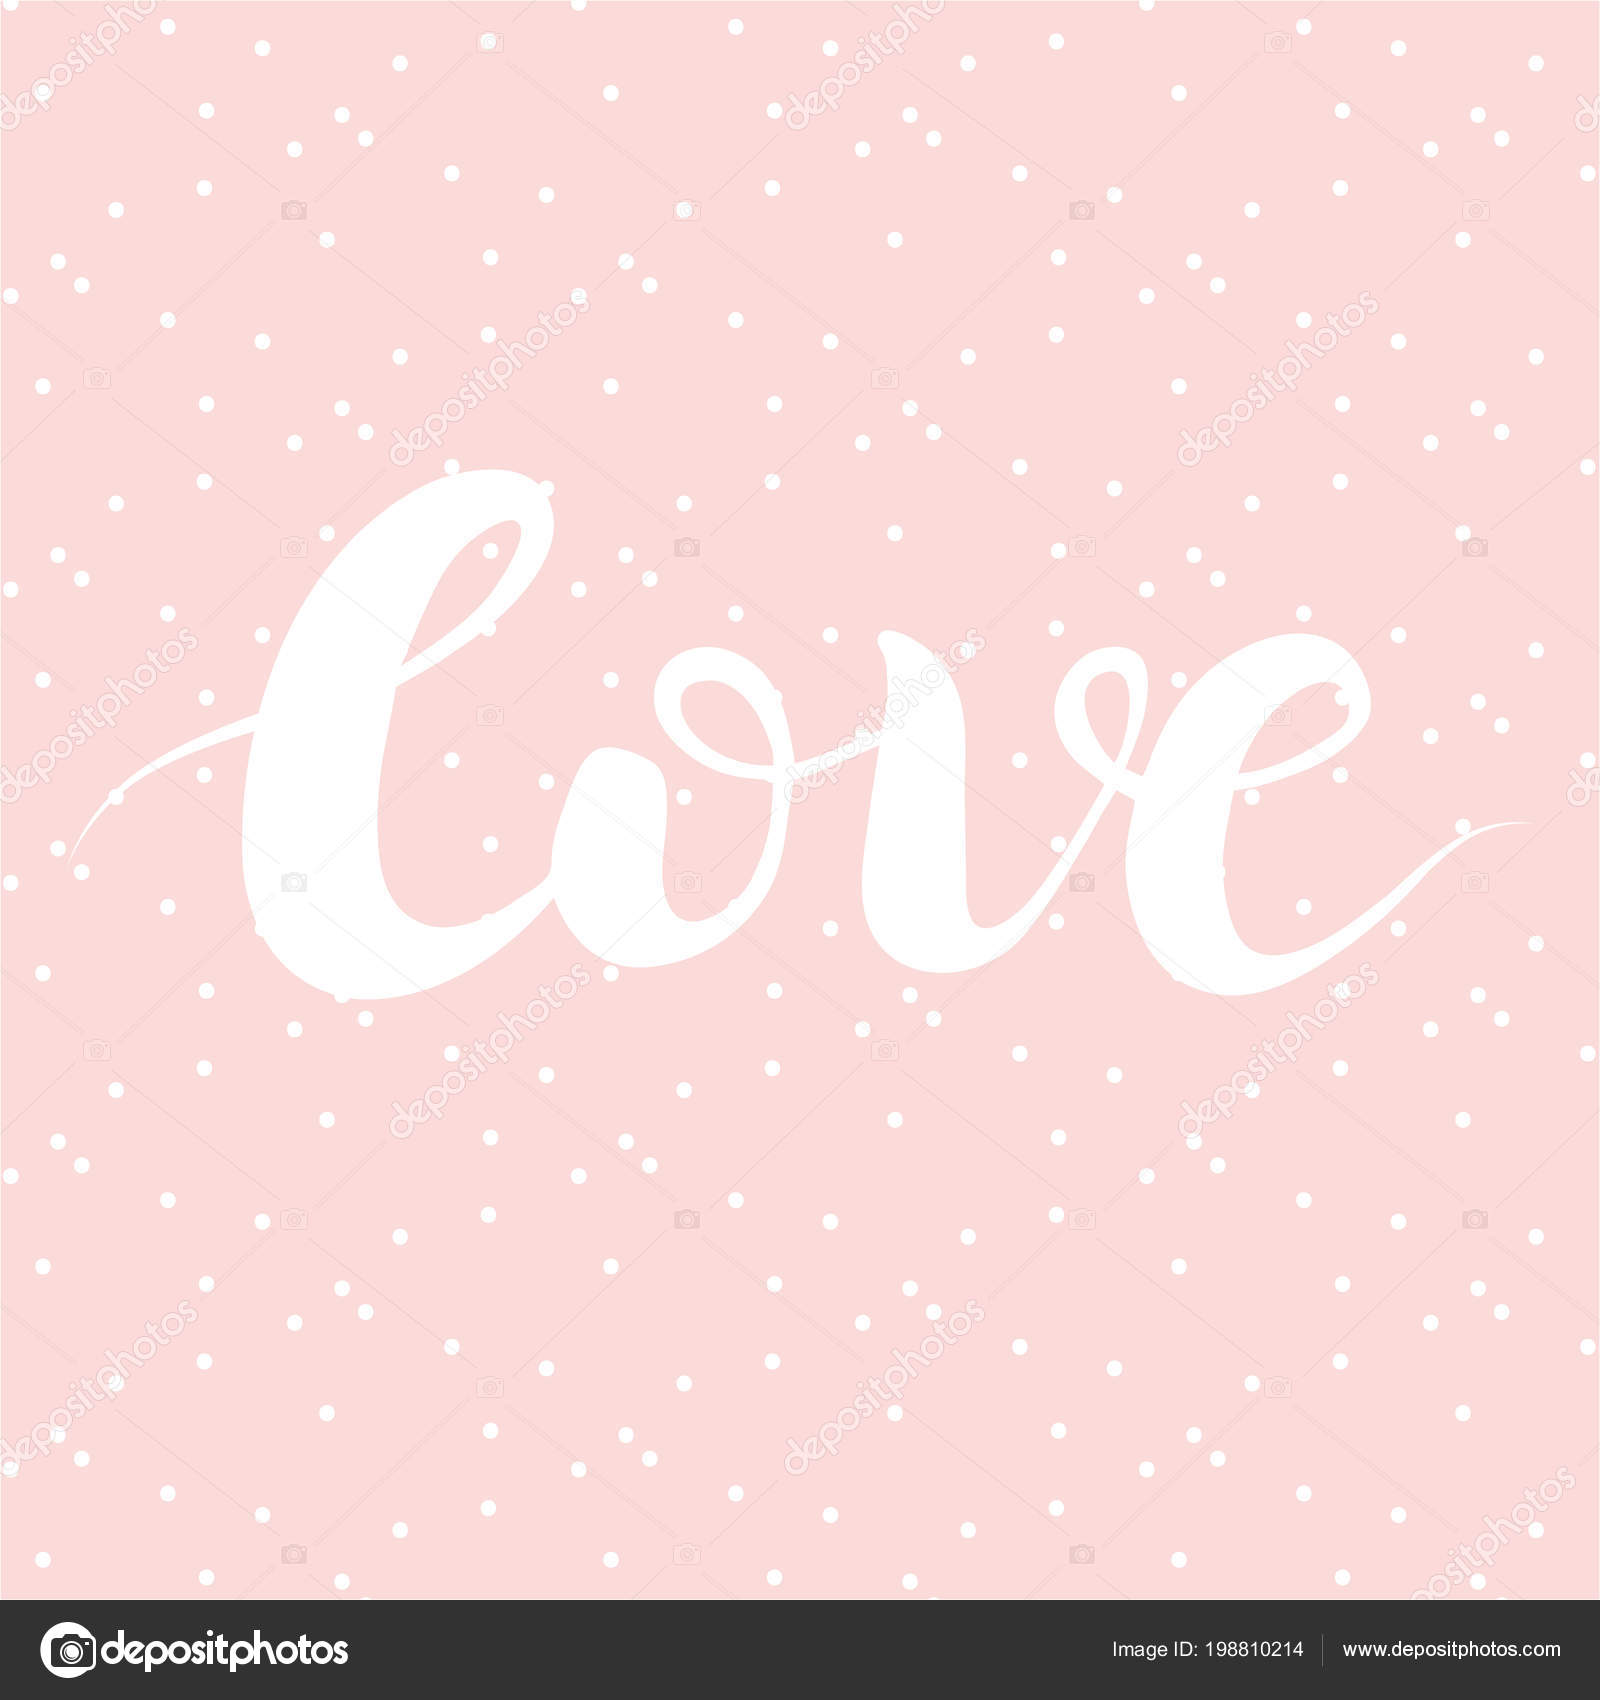 www pink word dot com